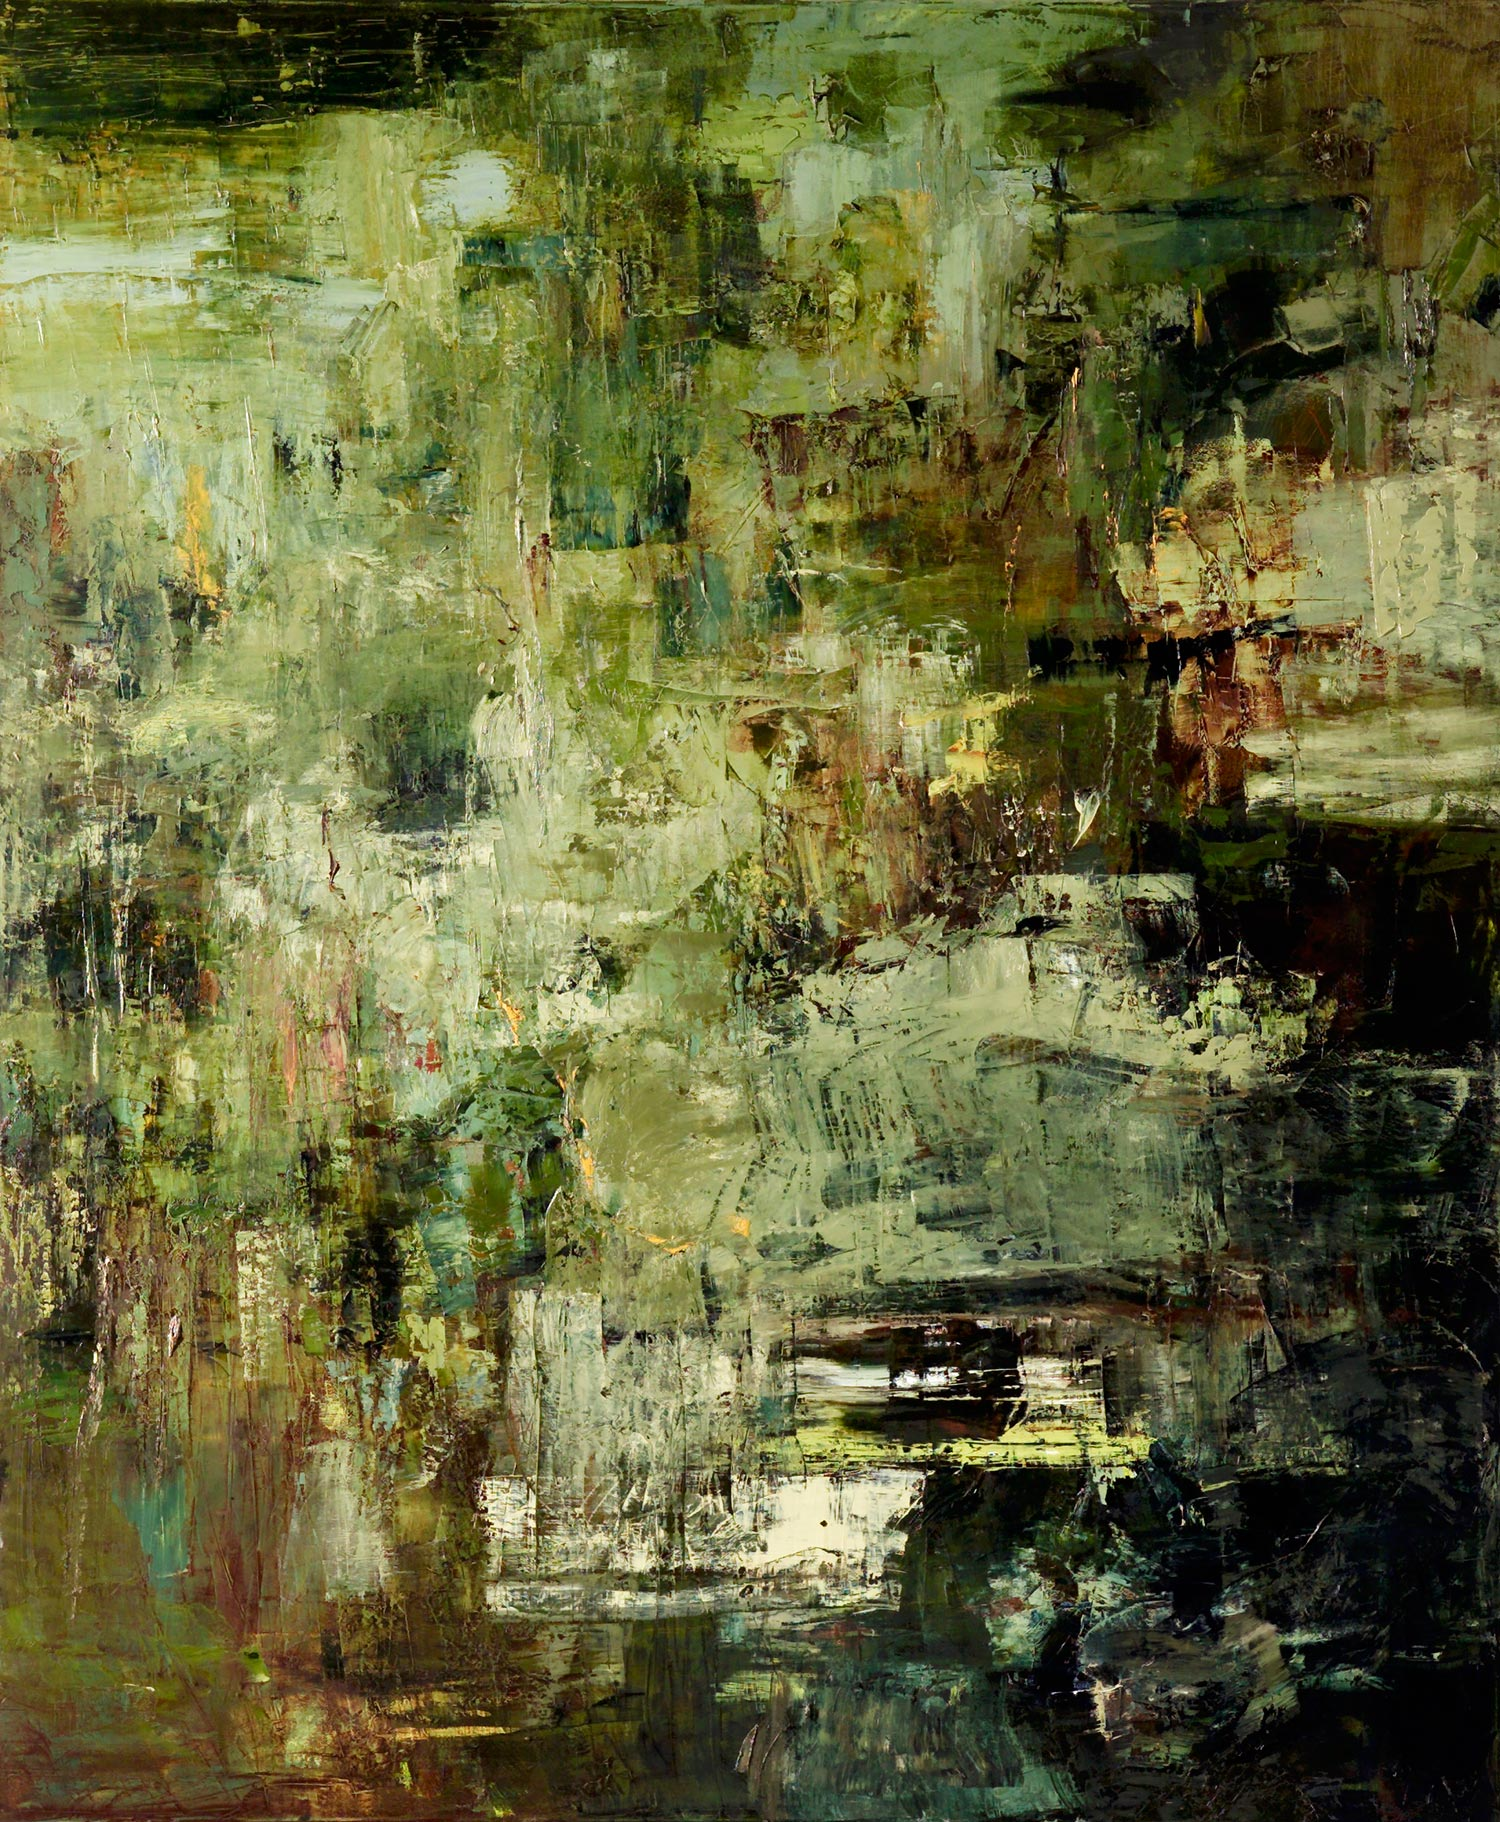 nicola_newman_artist_anita_traverso_gallery_natural_instincts5.jpg